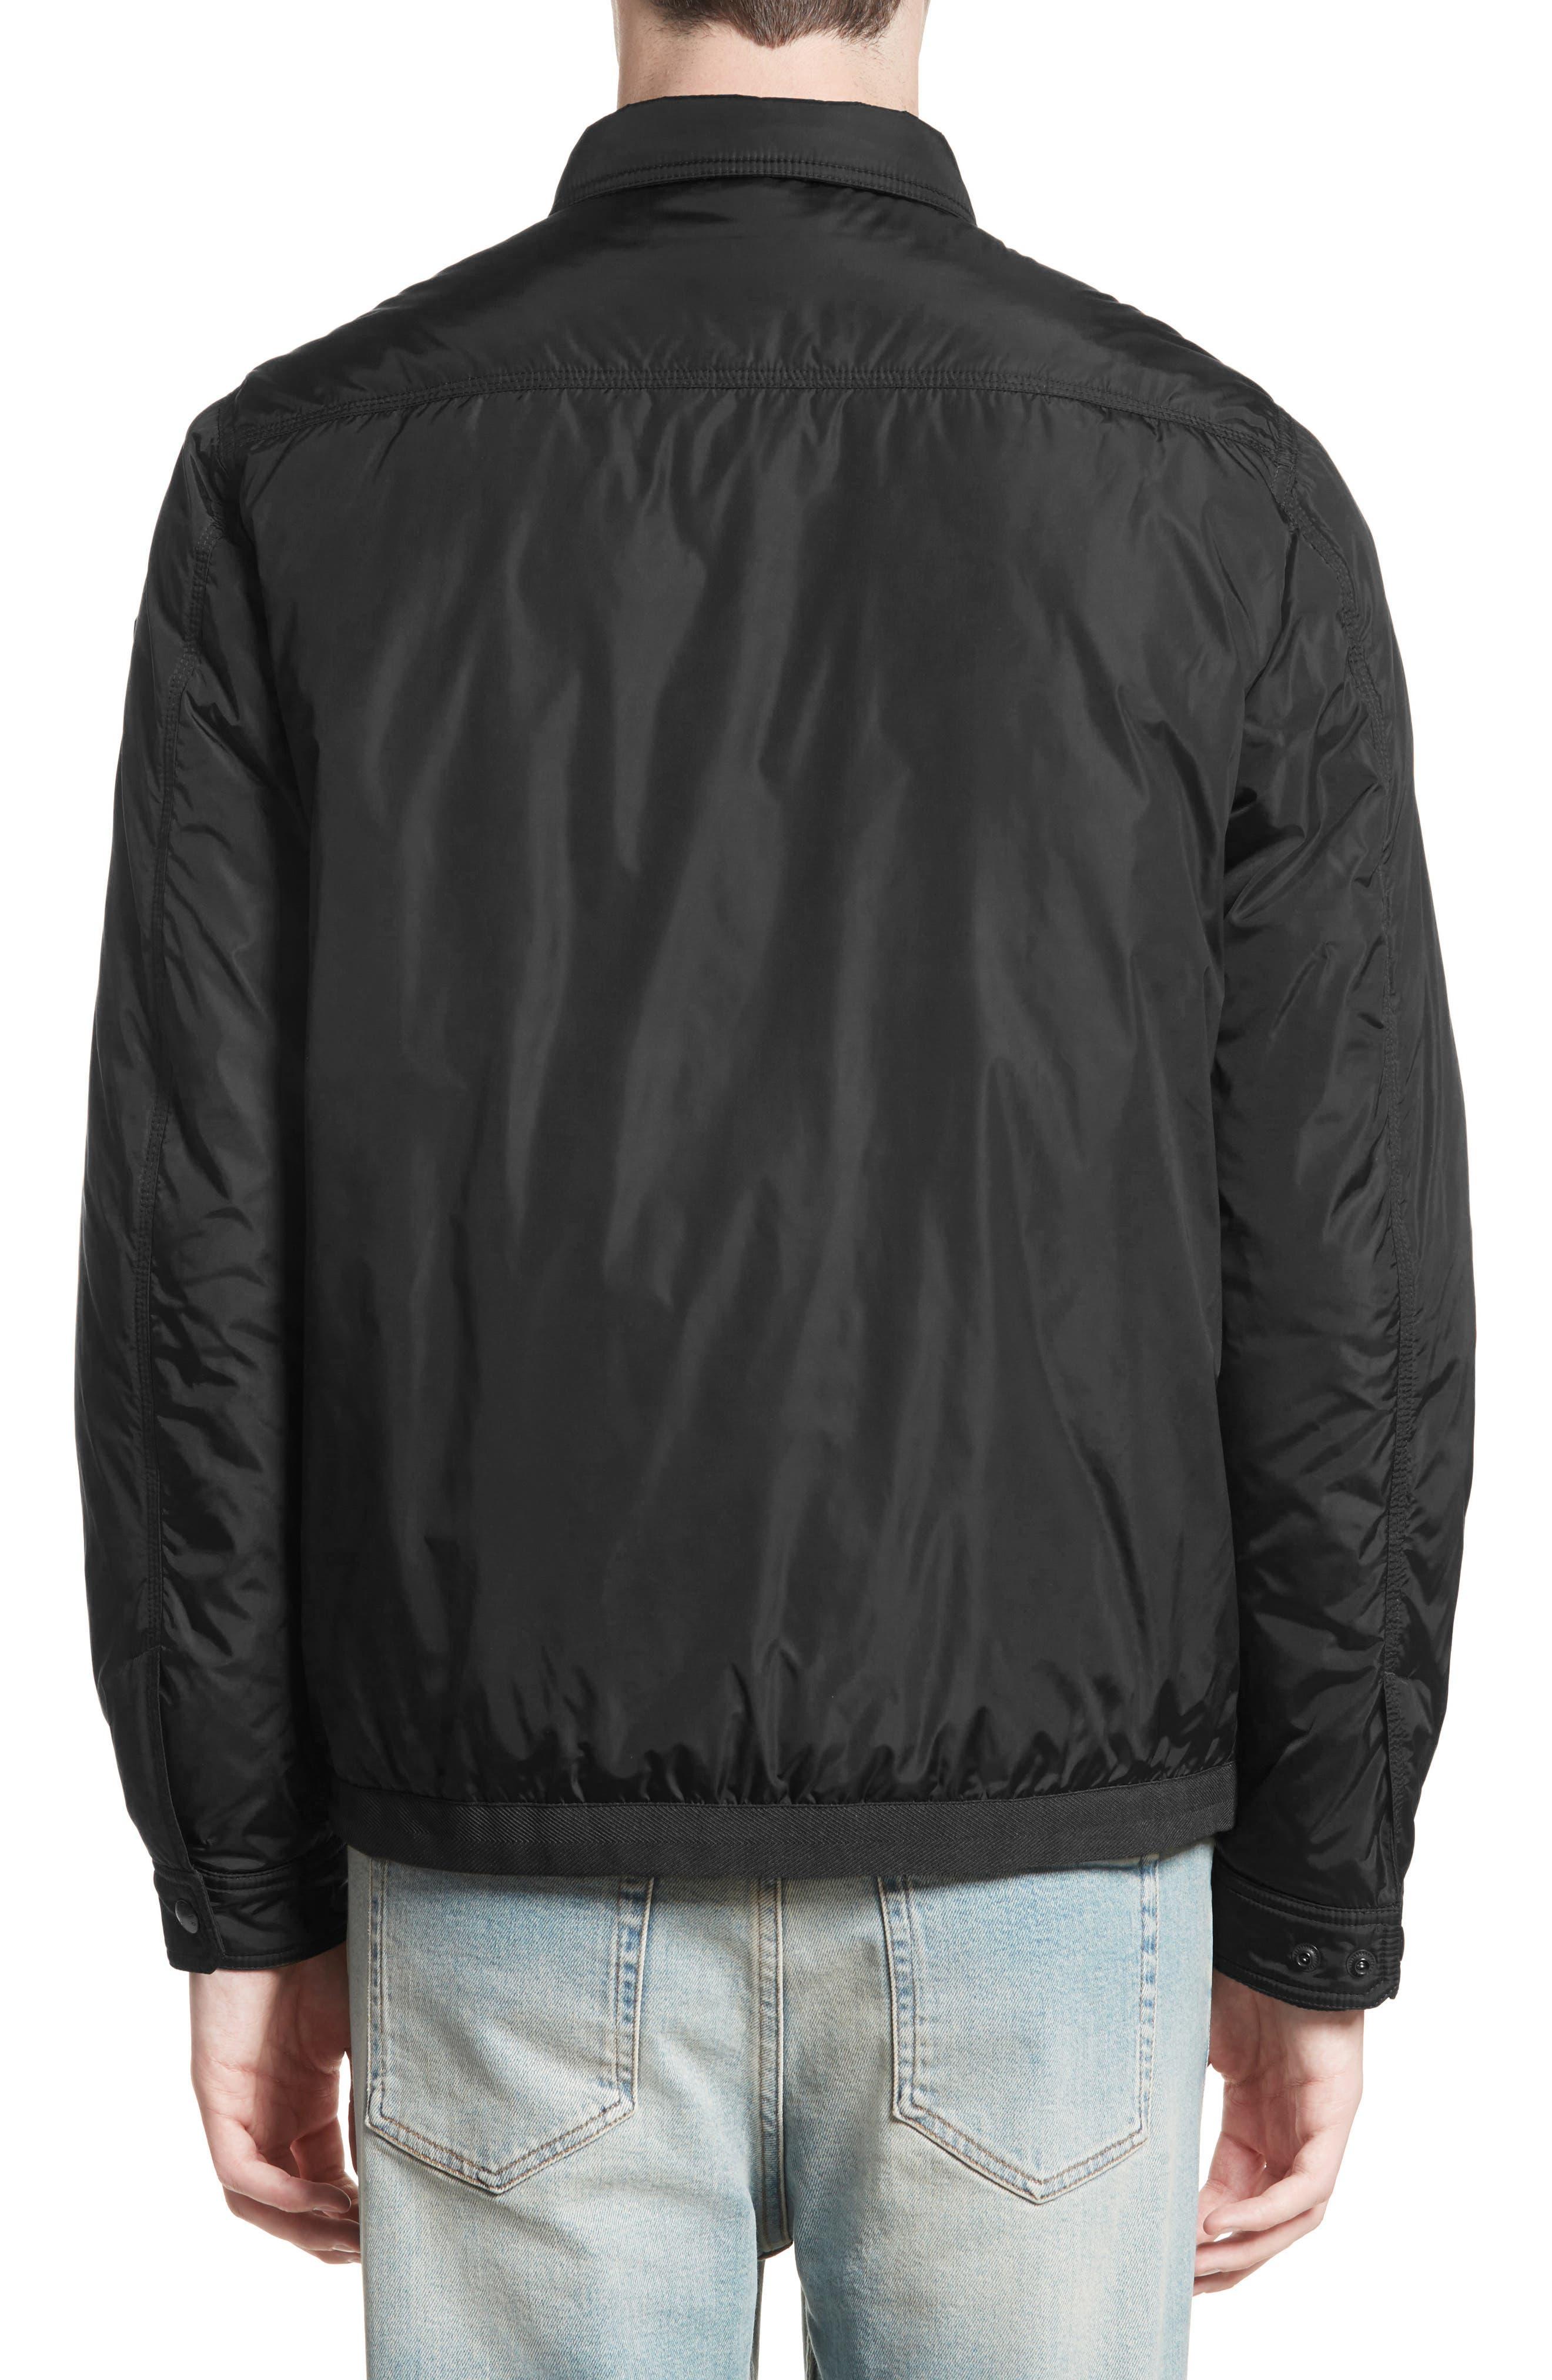 Erault Work Jacket,                             Alternate thumbnail 2, color,